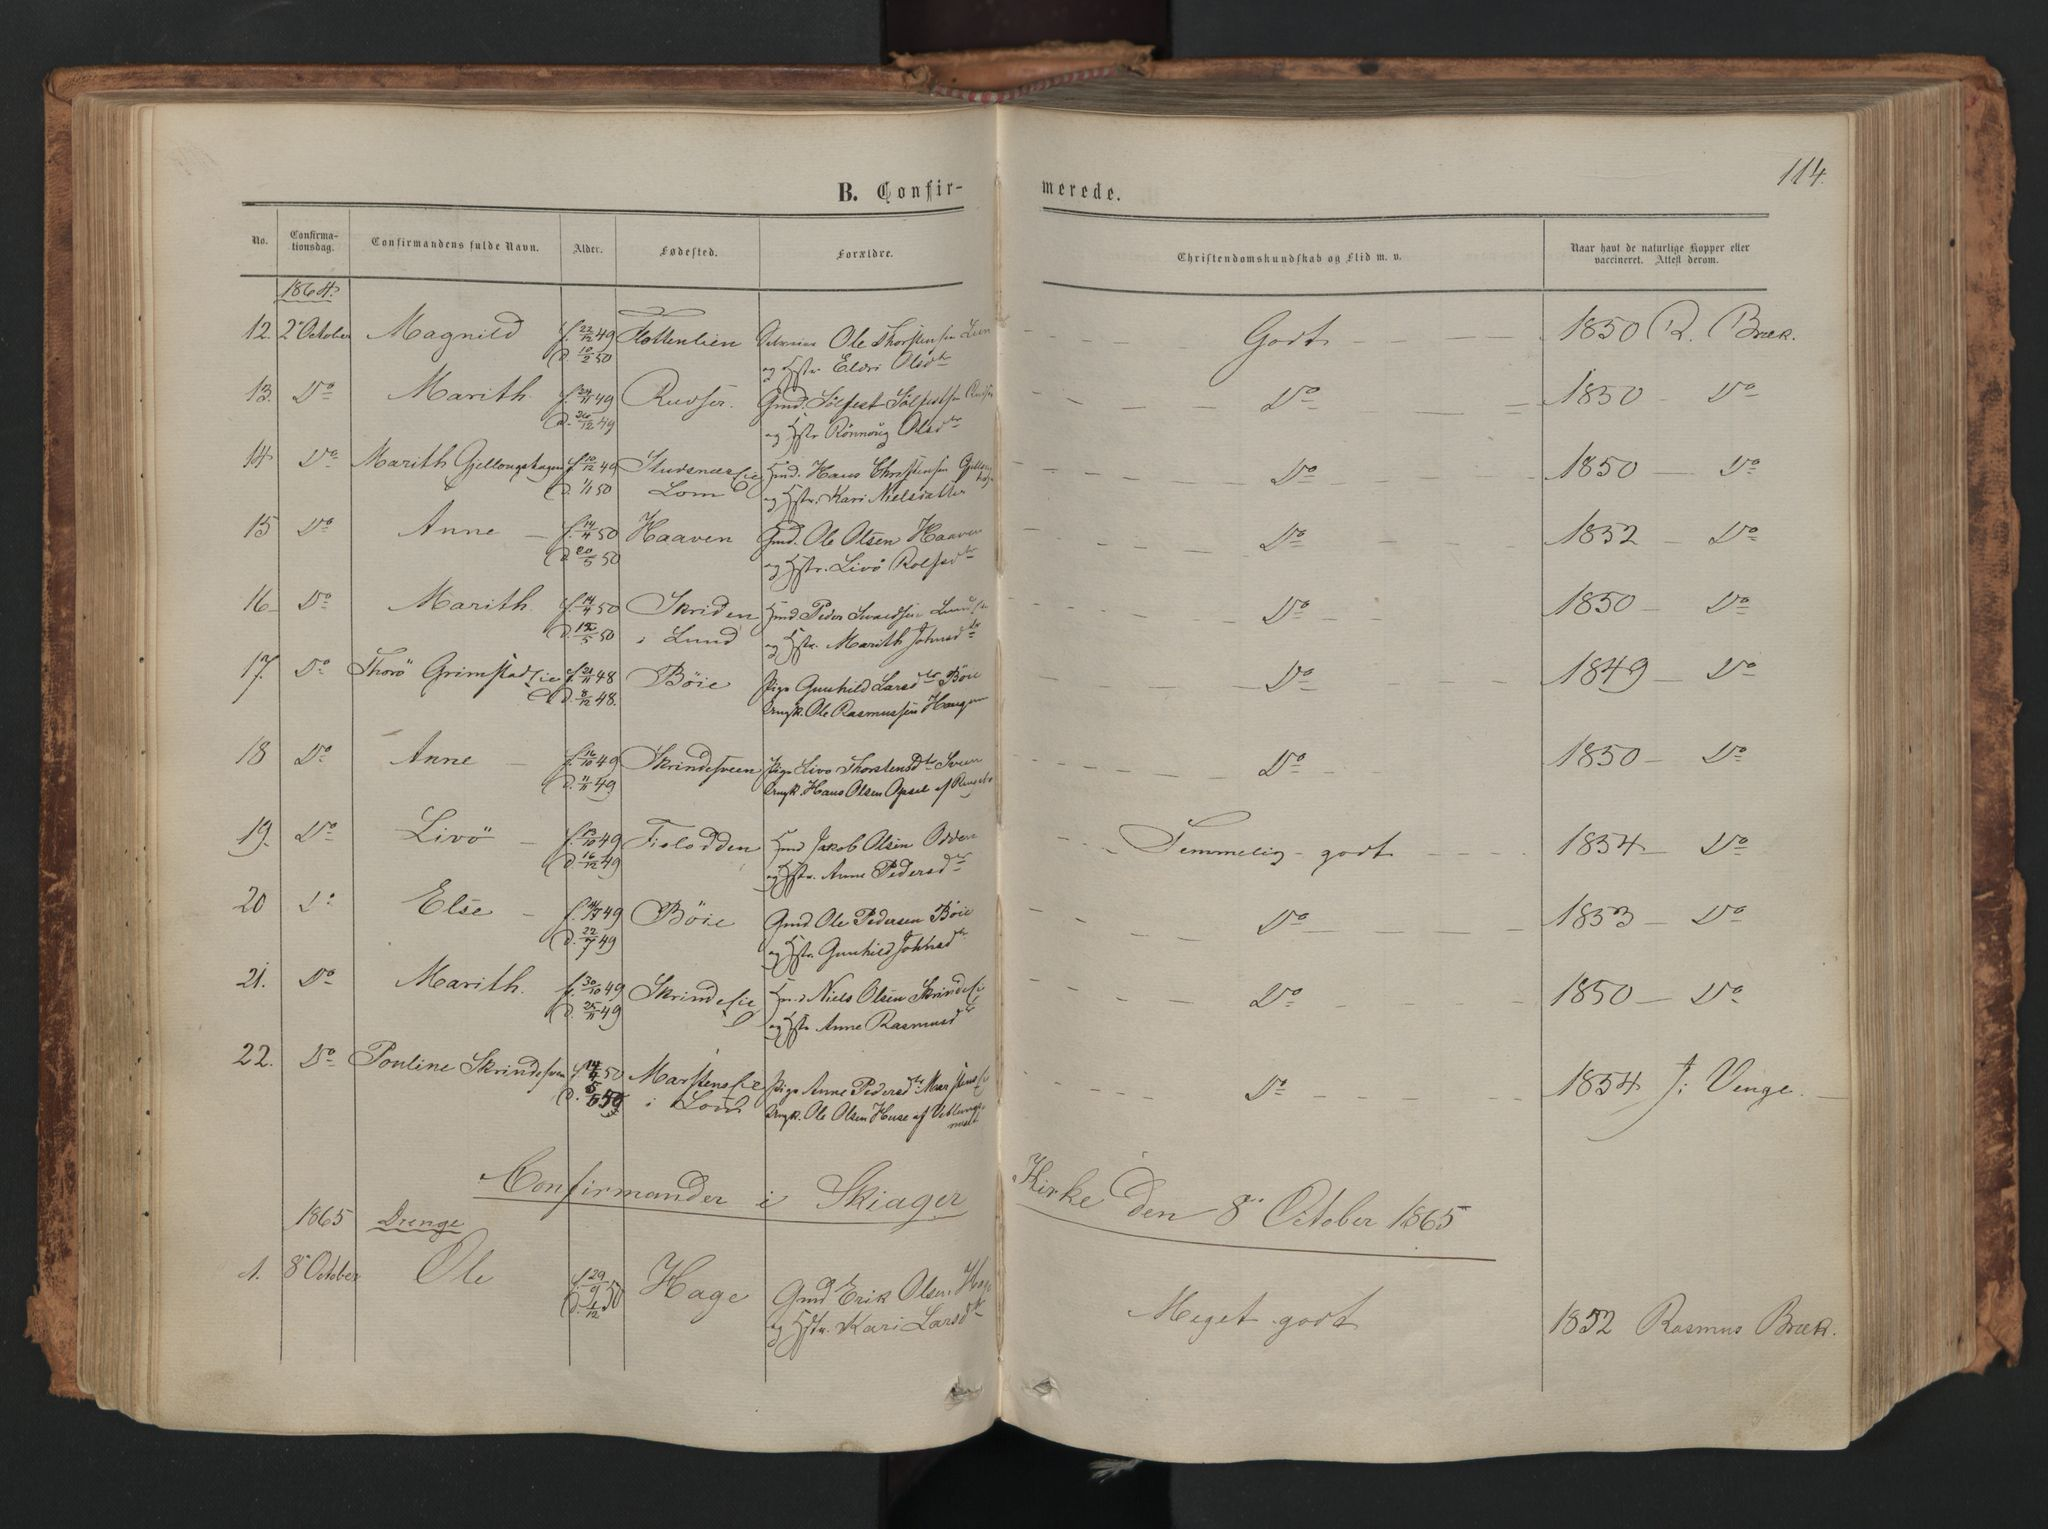 SAH, Skjåk prestekontor, Ministerialbok nr. 1, 1863-1879, s. 114